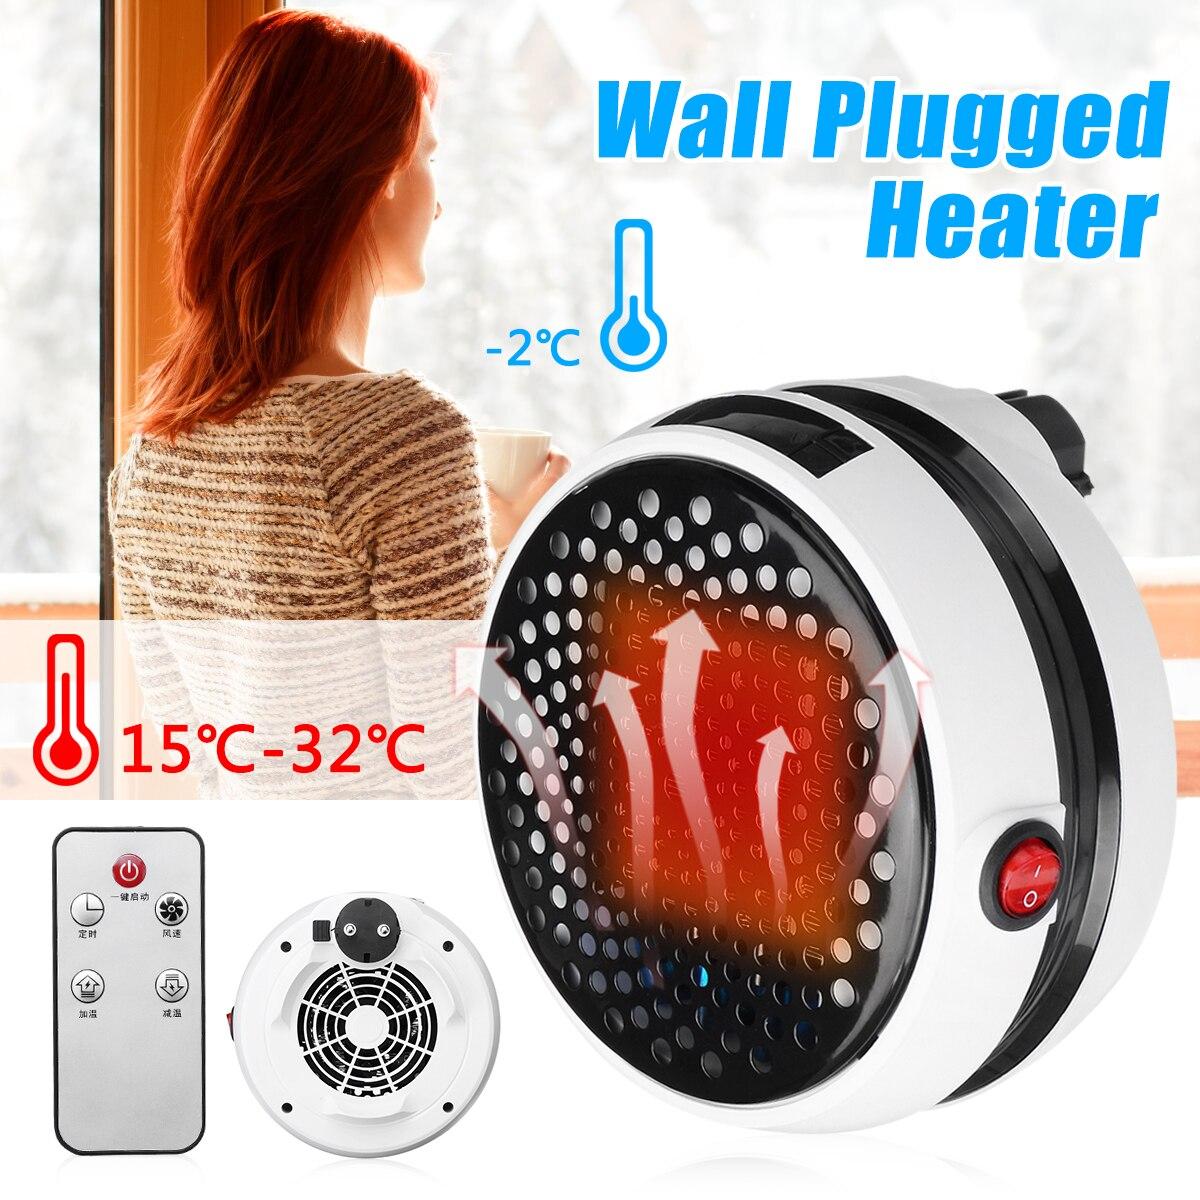 1000W Electric Heater Mini Fan Heater Desktop Household Wall Handy Heating Stove Radiator Warmer Machine for Winter